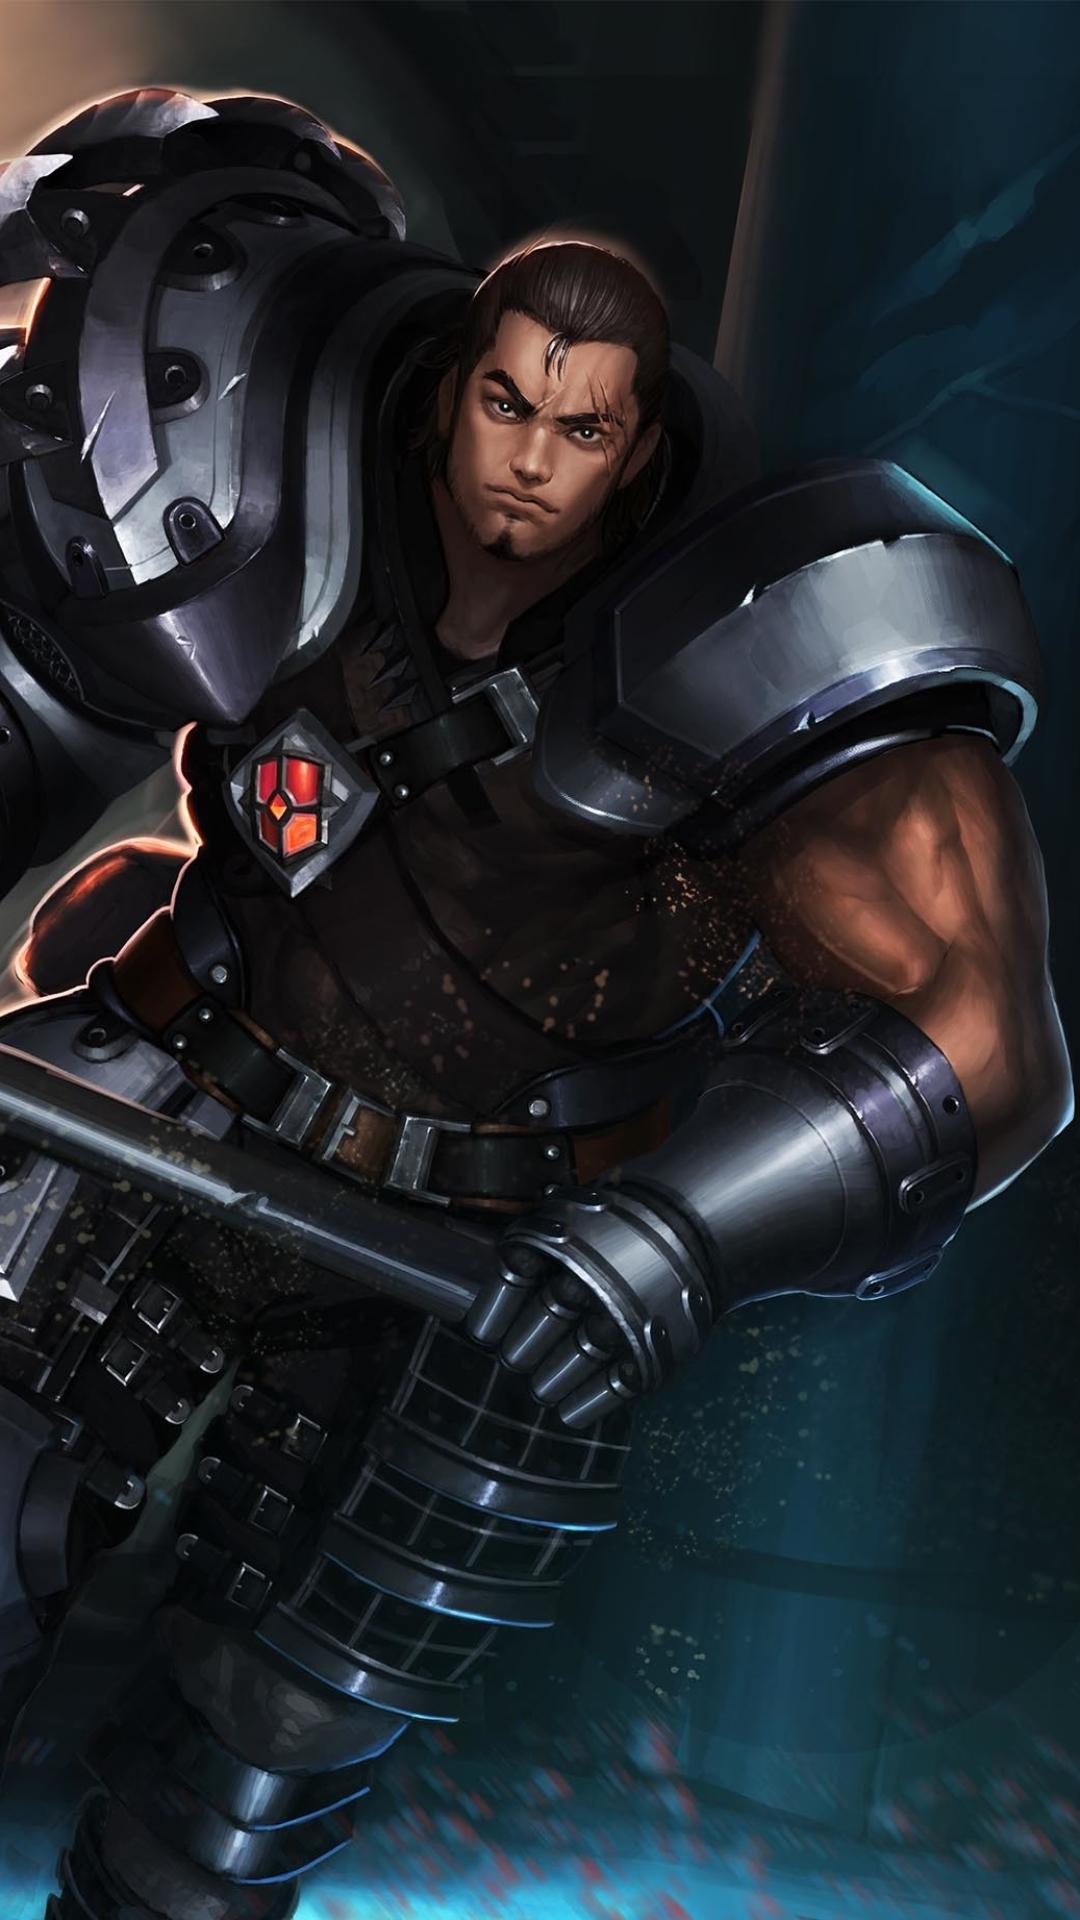 Video Game League Of Legends 1080x1920 Wallpaper Id 653306